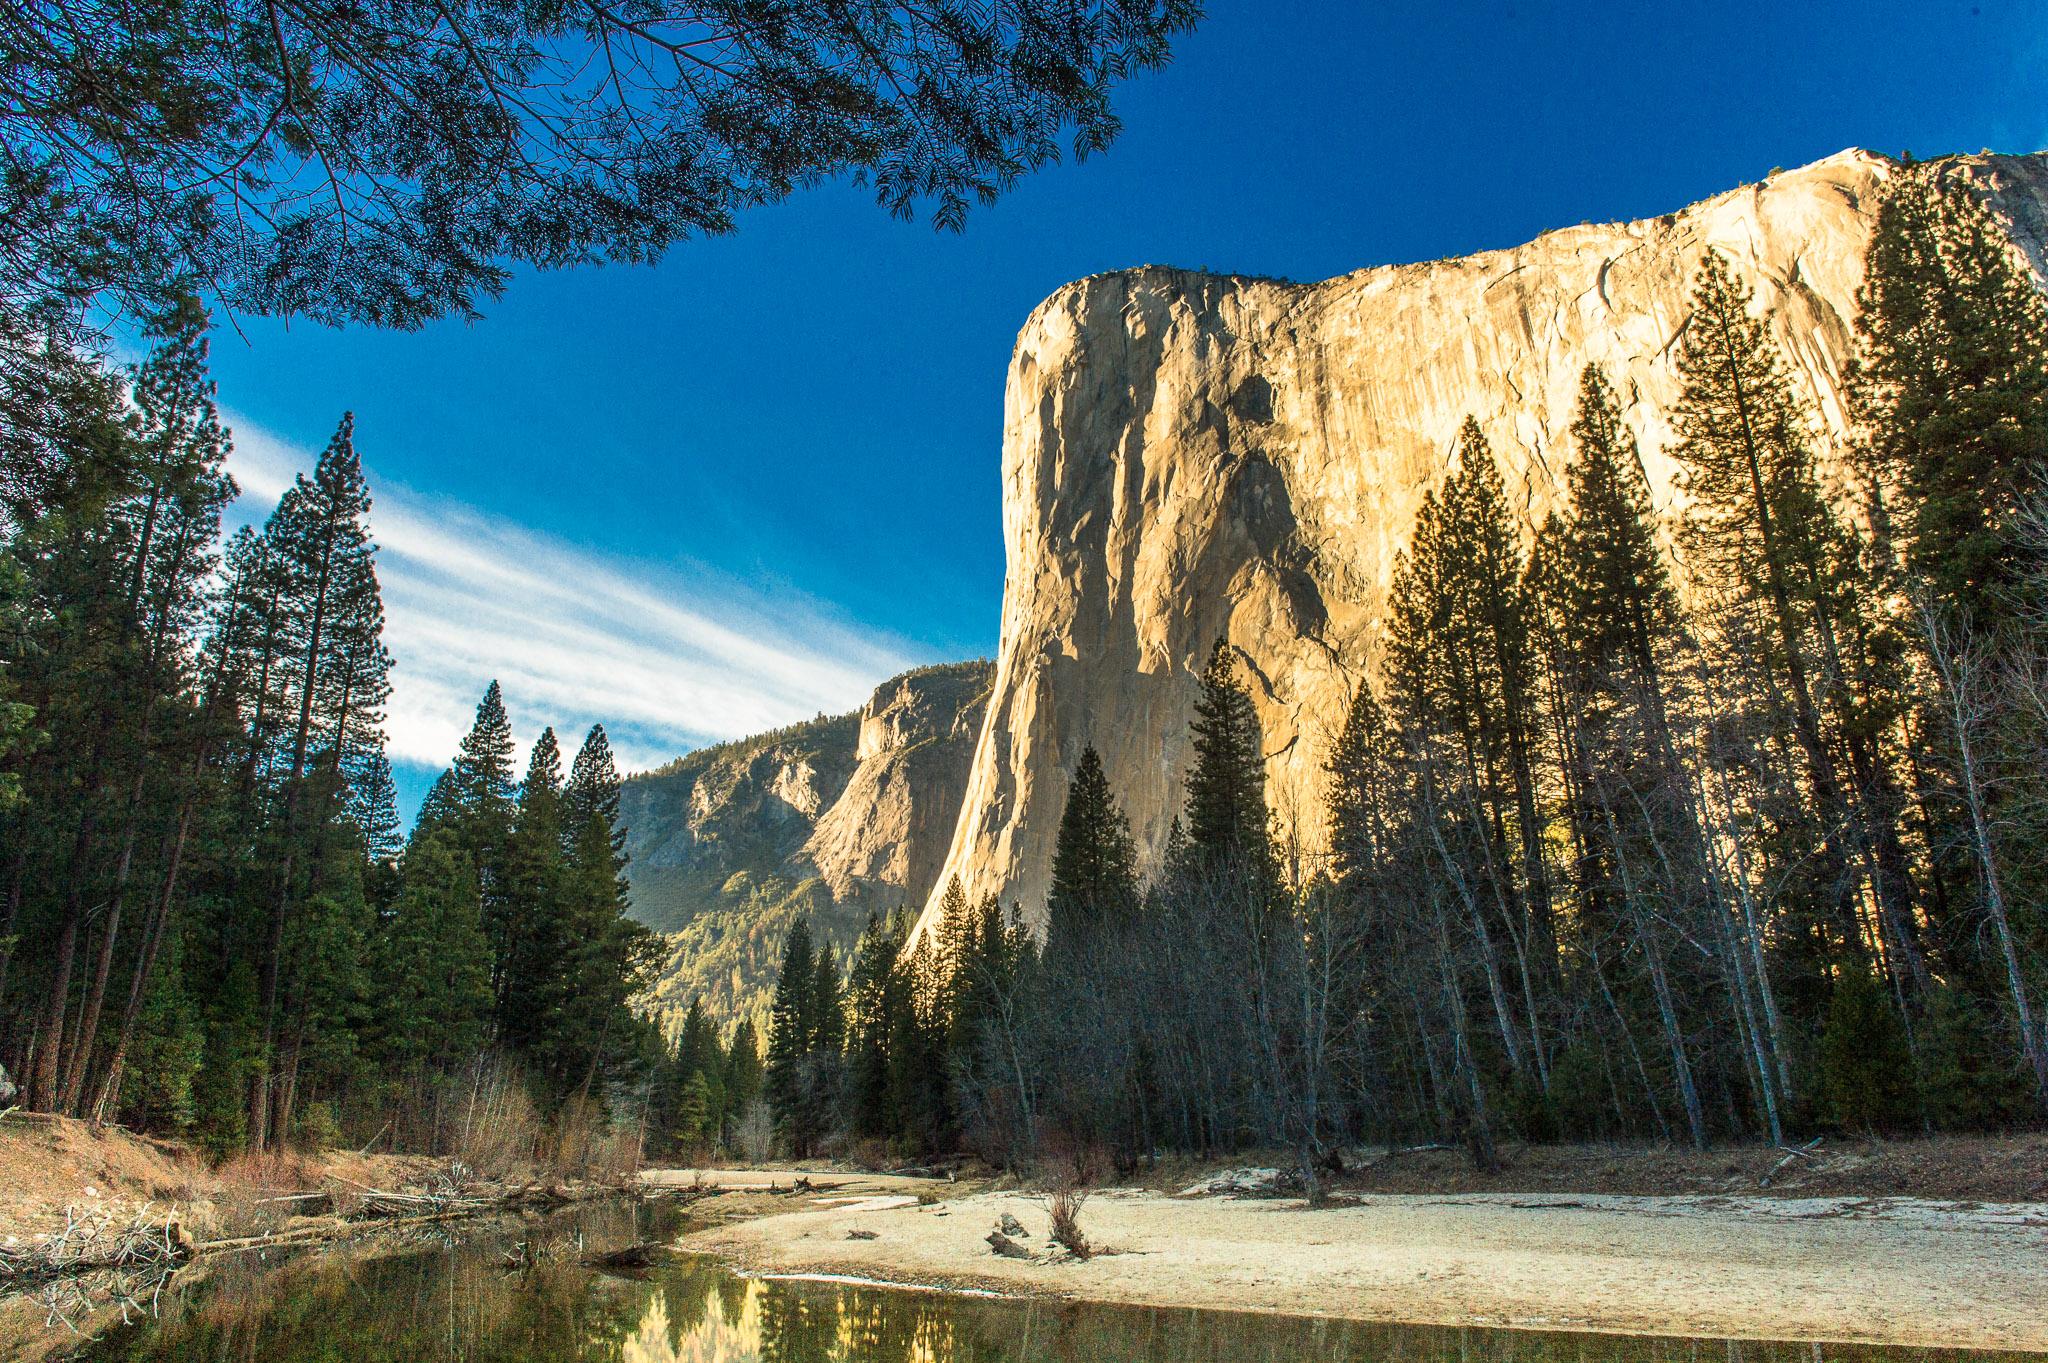 Jason-Davis-Images-Yosemite-0040.jpg